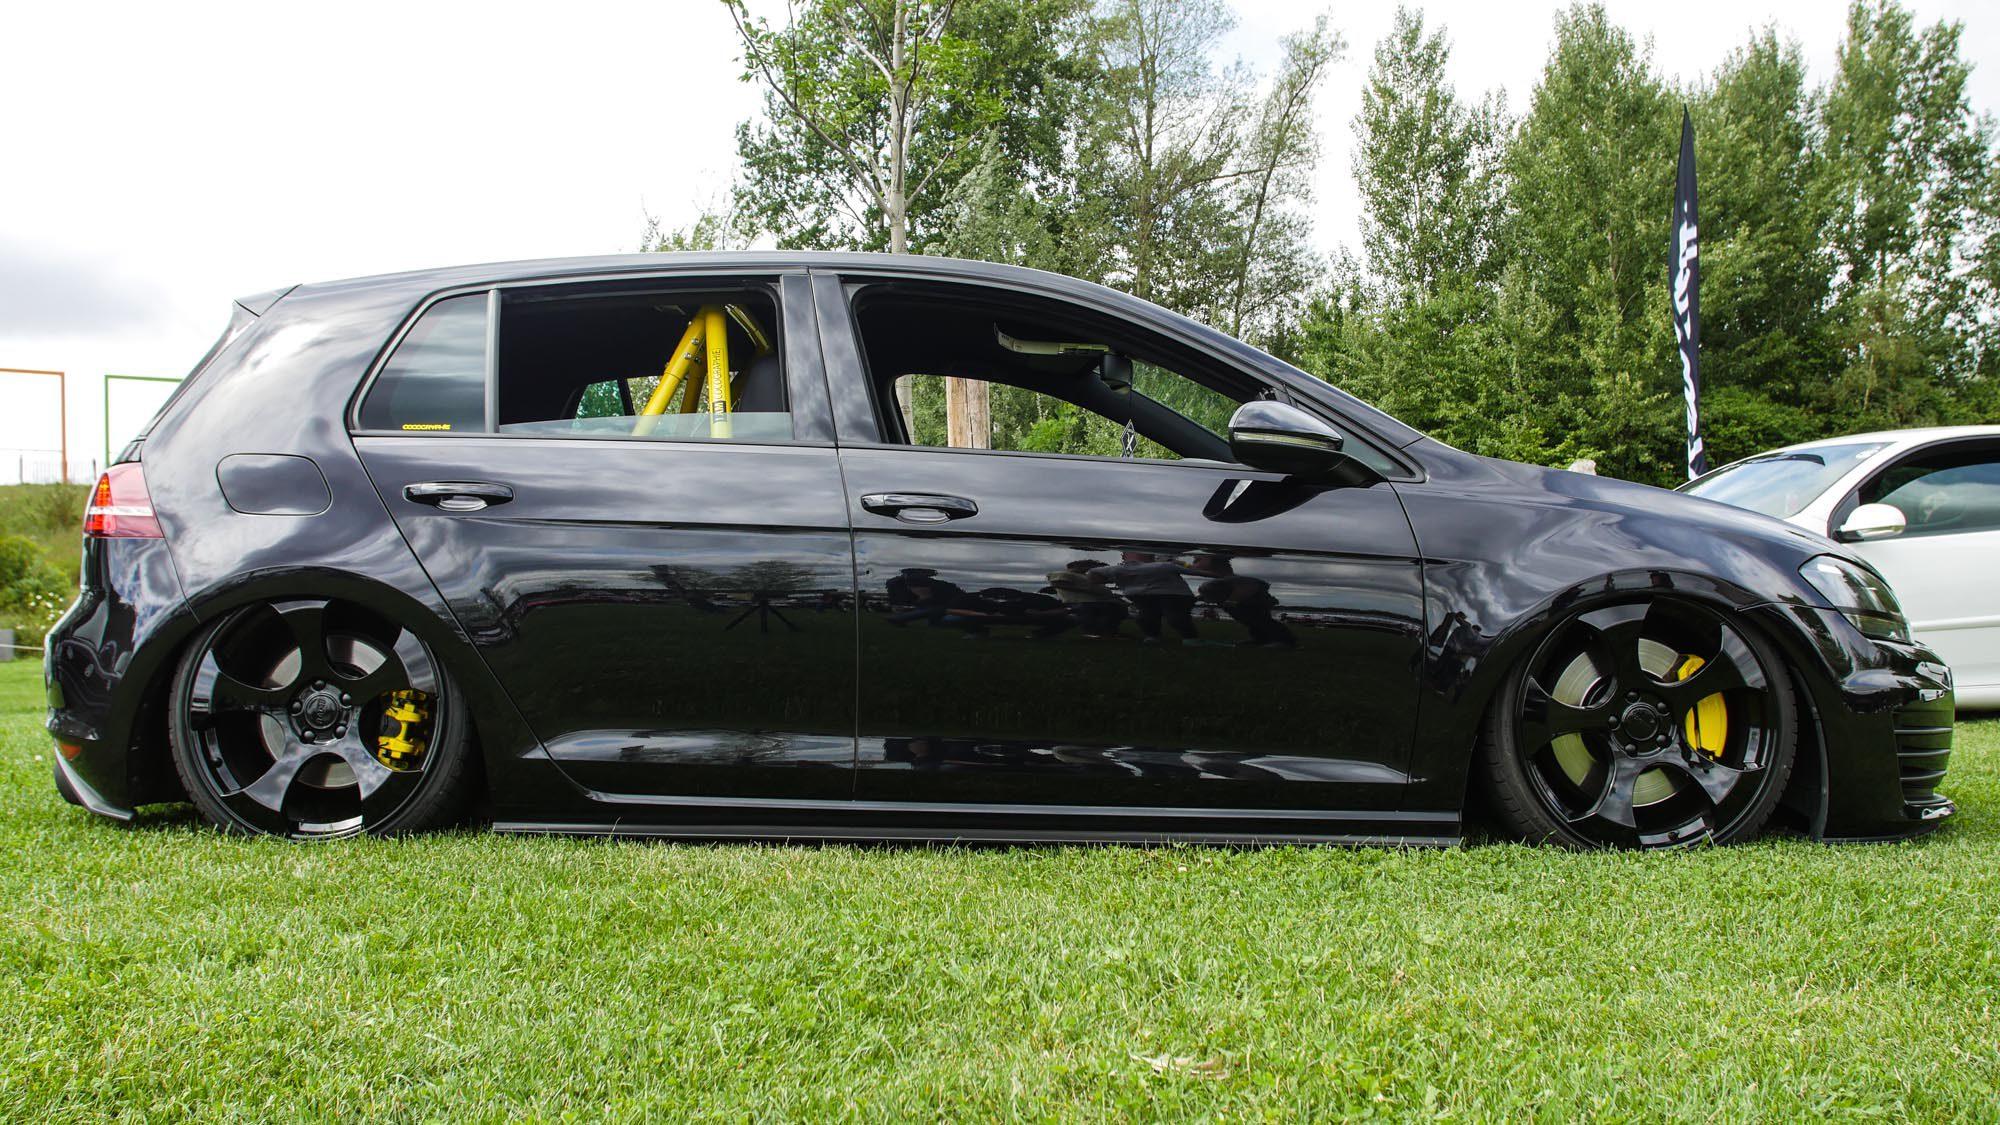 VW Golf VII GTI Black is the new black AUTOTUNING DE